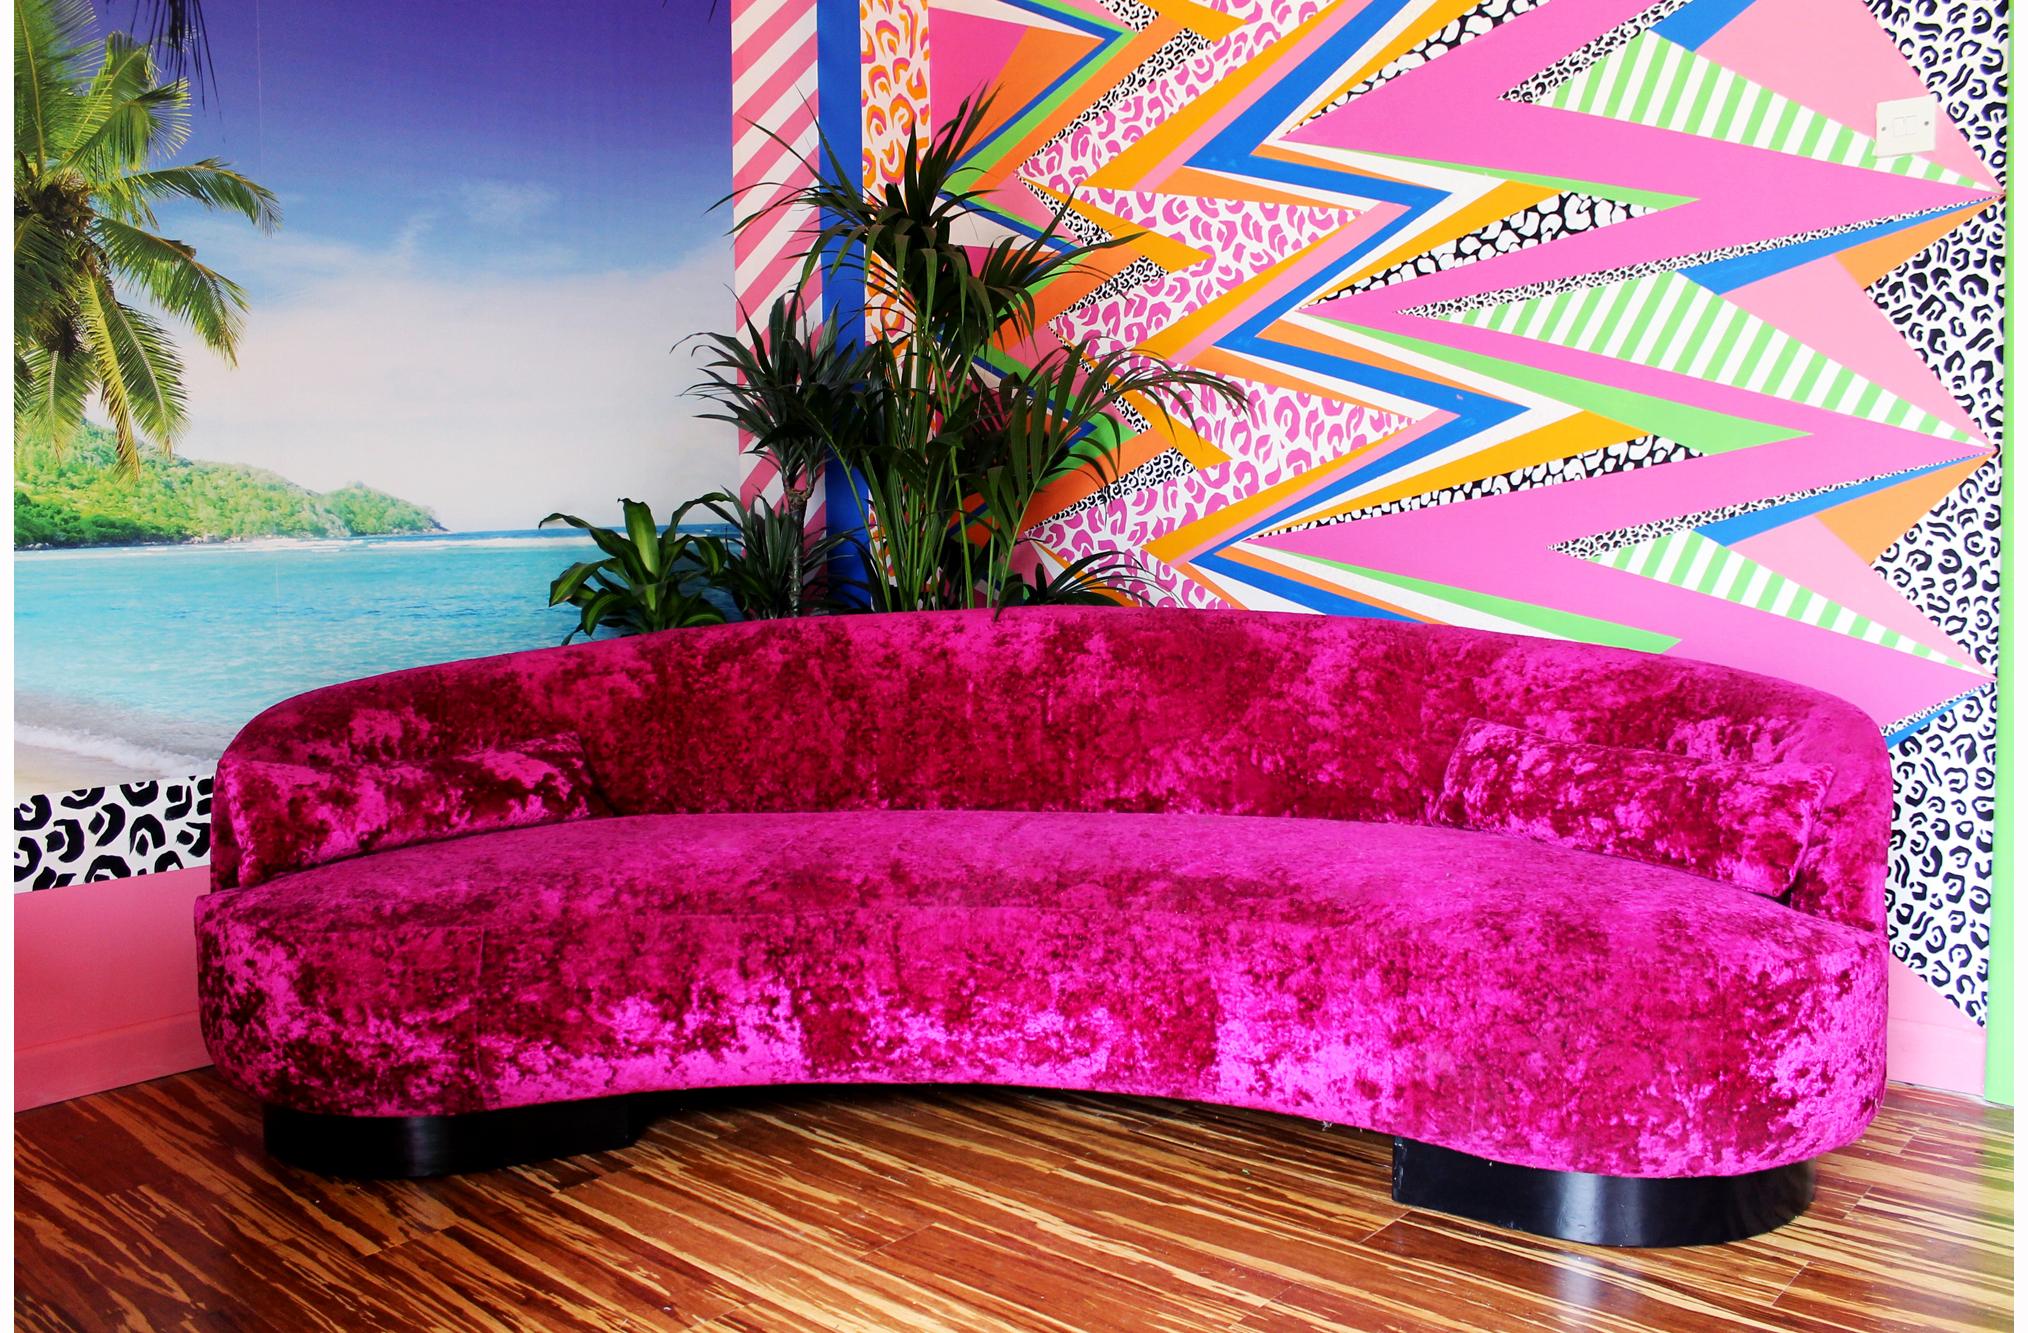 Kitchen Sofa Feet Full Landscape w border.jpg